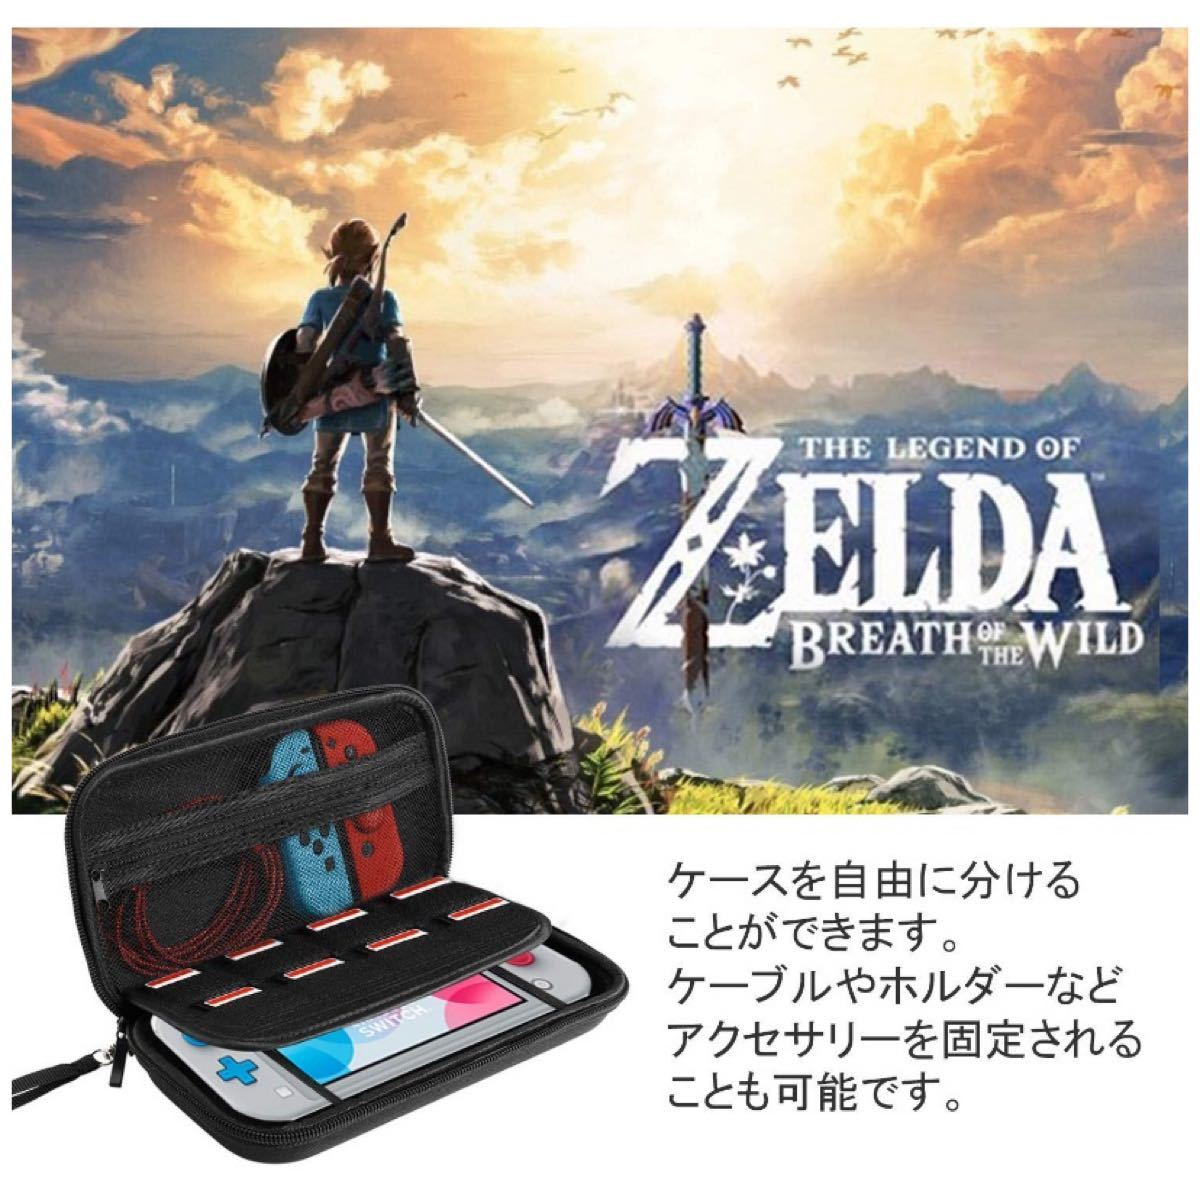 Nintendo Switch Liteケース 大容量 耐衝撃 防塵 防水 防汚